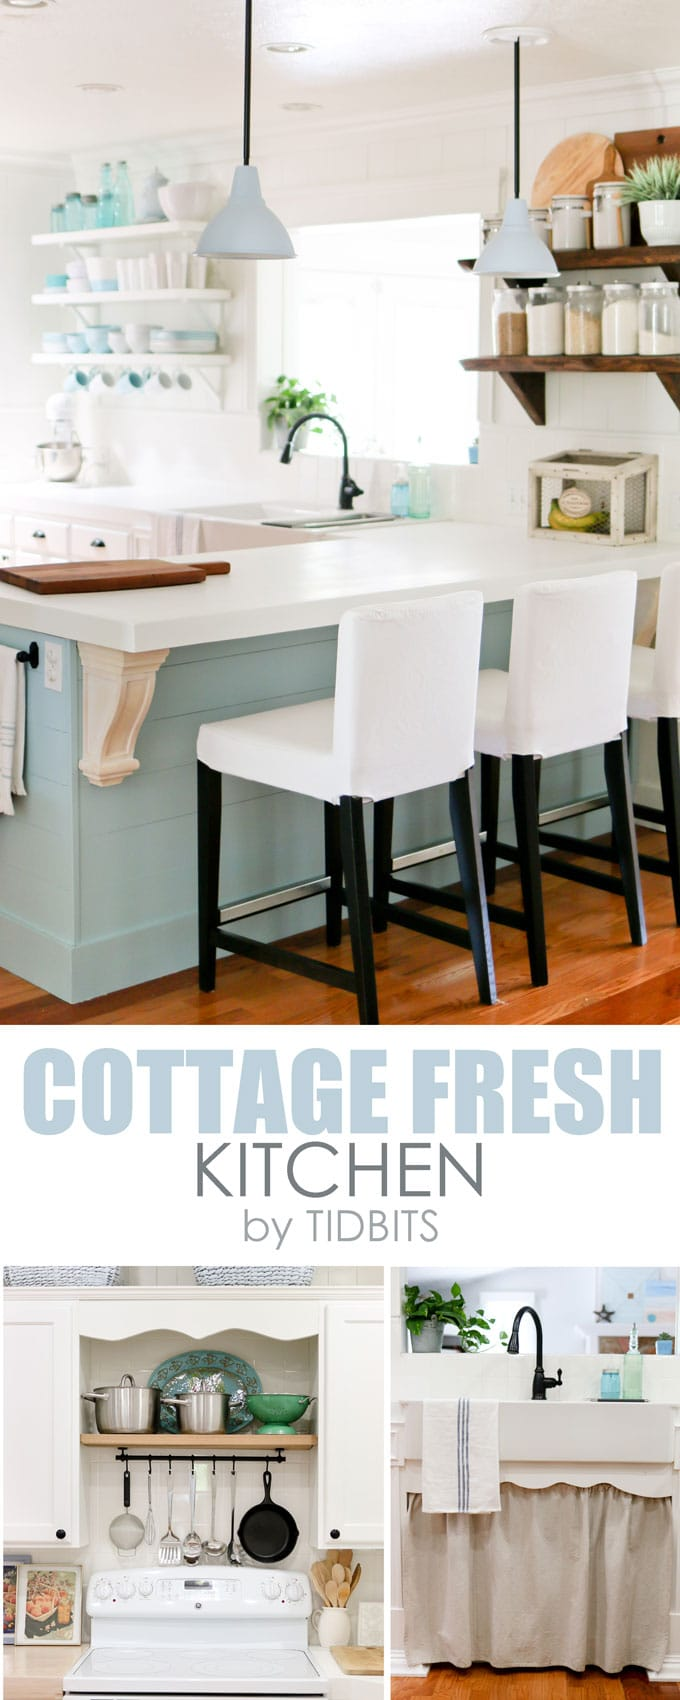 fresh kitchen designs. cottage fresh kitchen, by tidbits kitchen designs